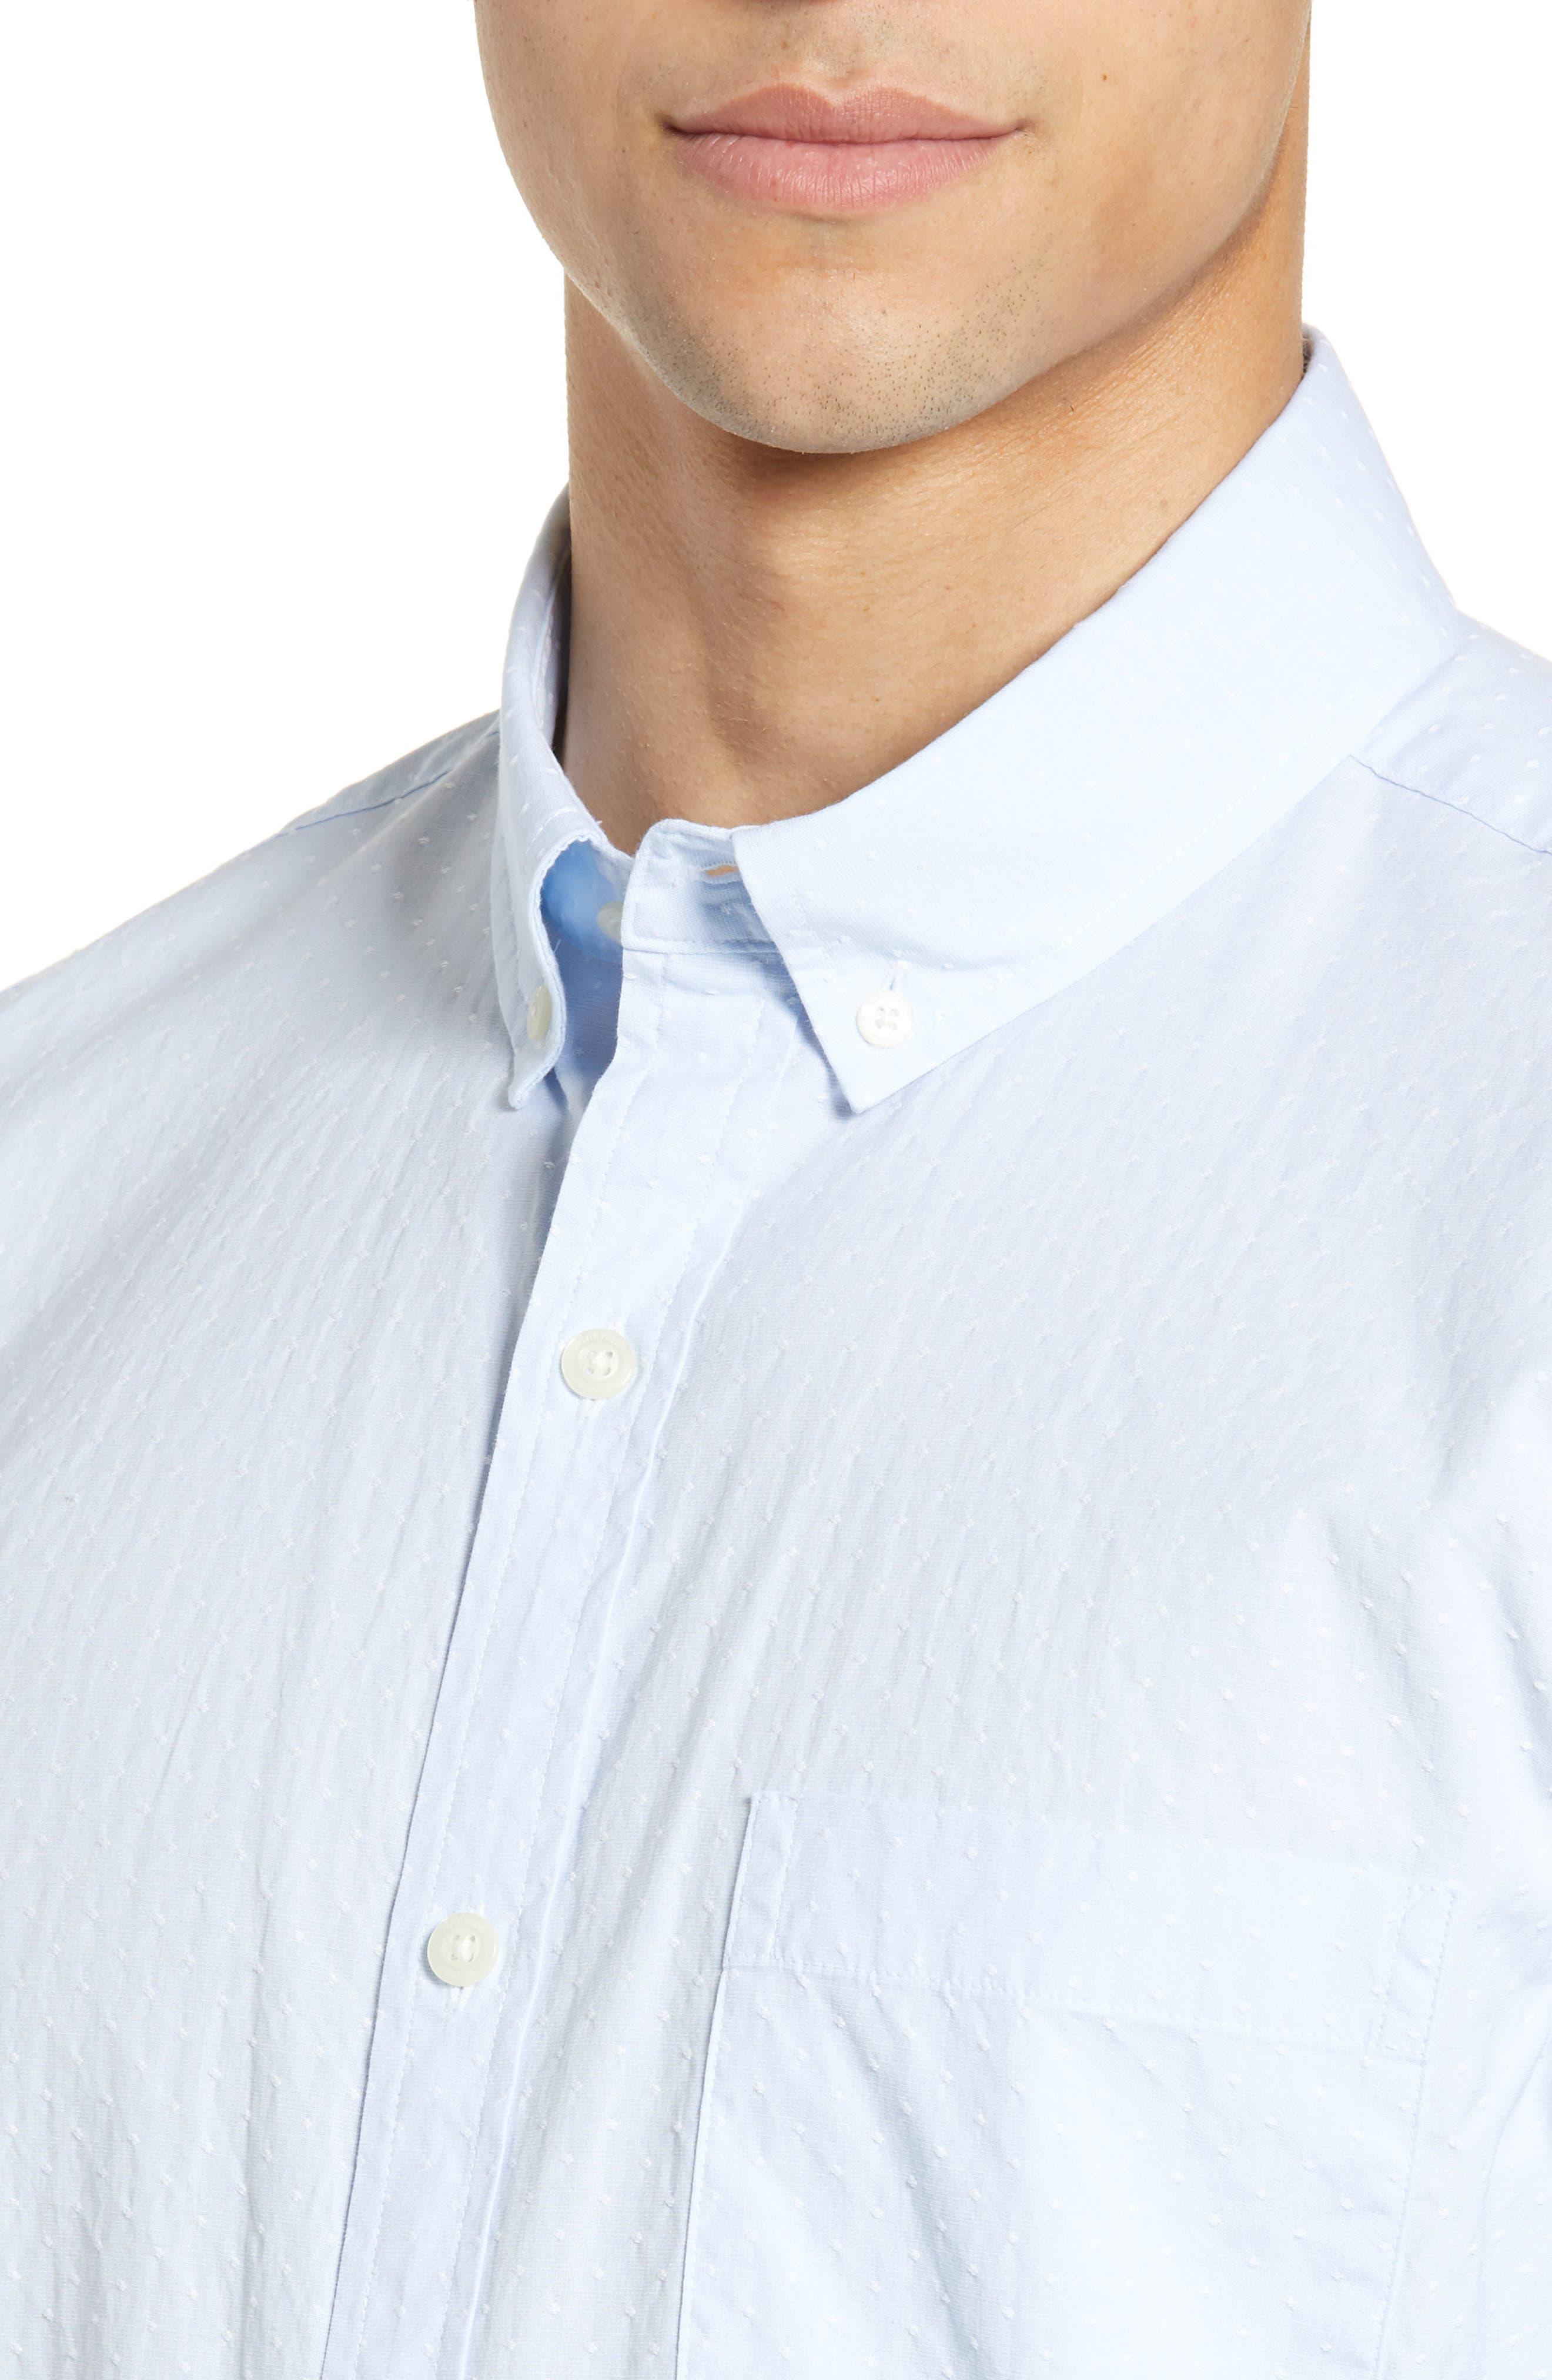 VINEYARD VINES, Wavine Slim Fit Dobby Sport Shirt, Alternate thumbnail 2, color, JAKE BLUE